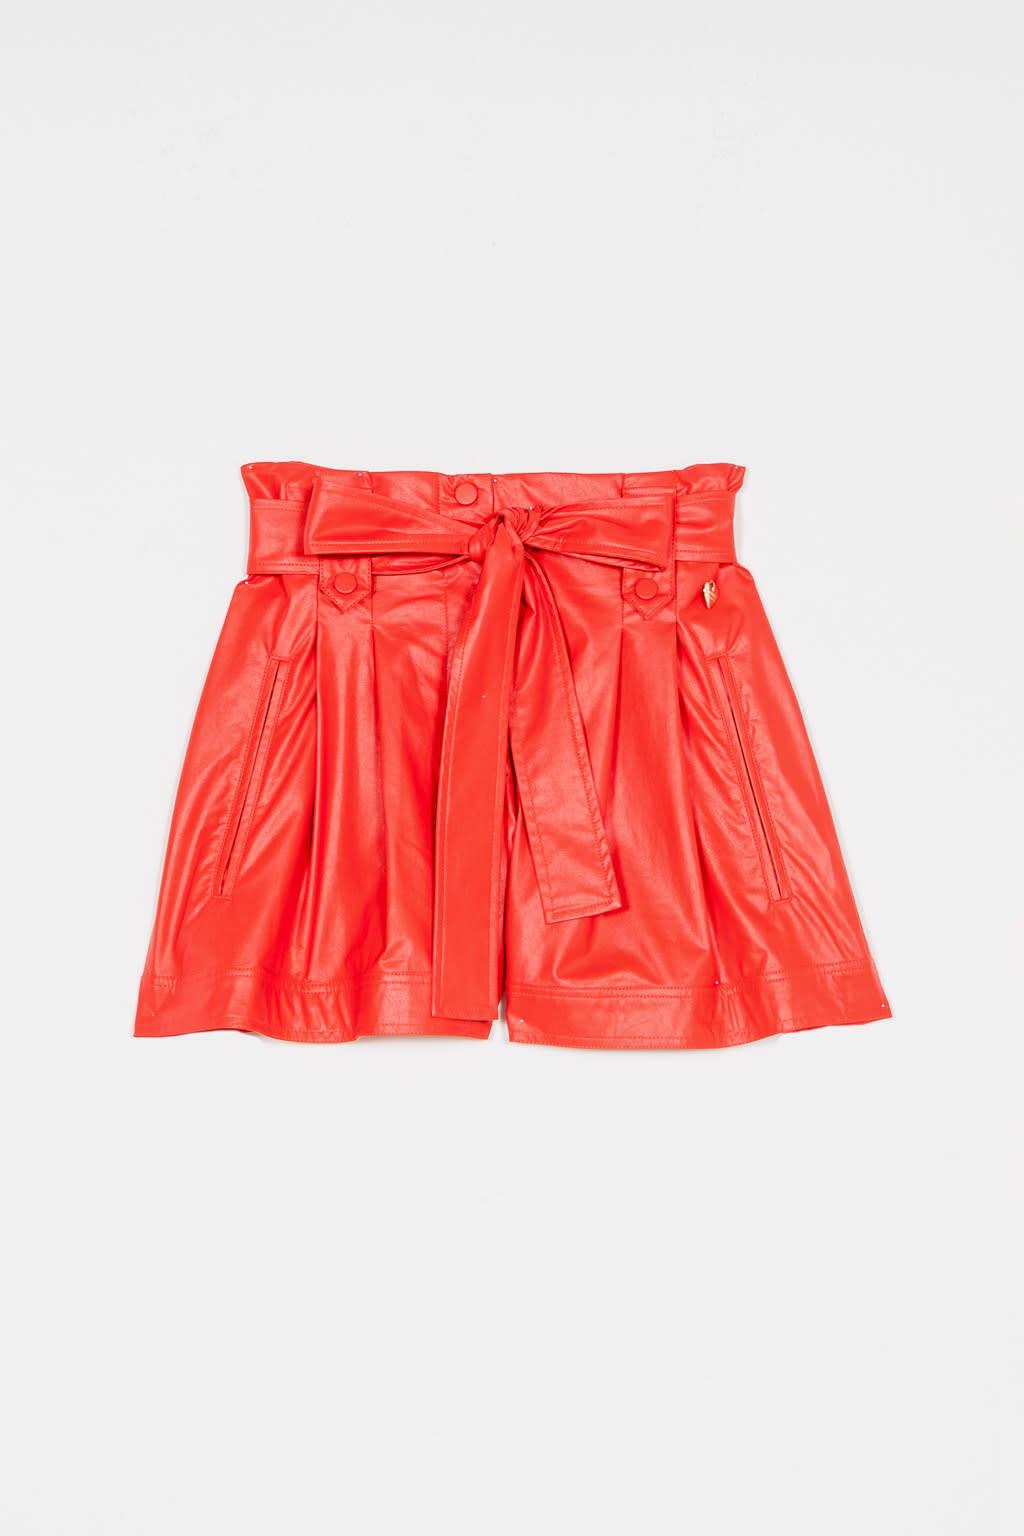 Twin-Set S/S Shorts red orange Twin-Set